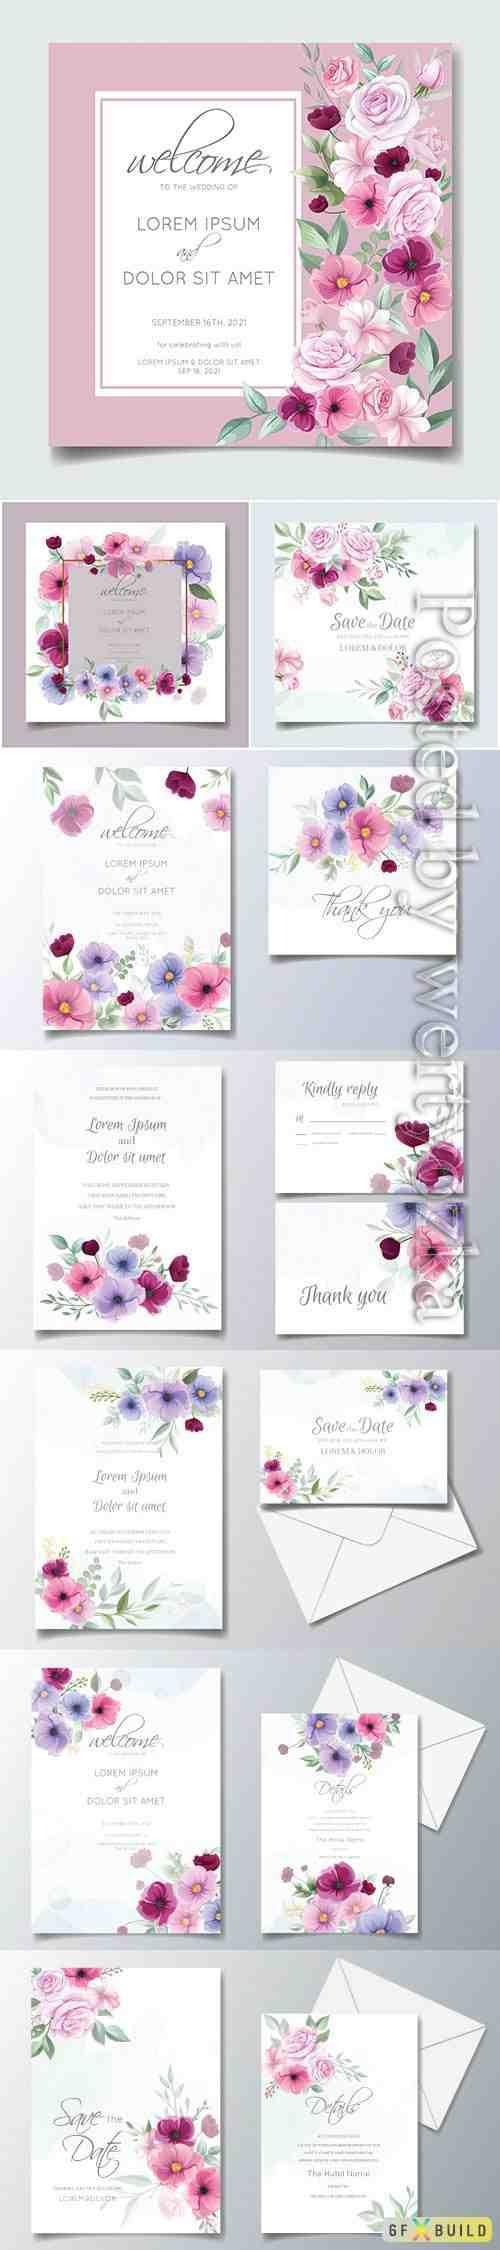 Colorful hand drawn floral wedding invitation card